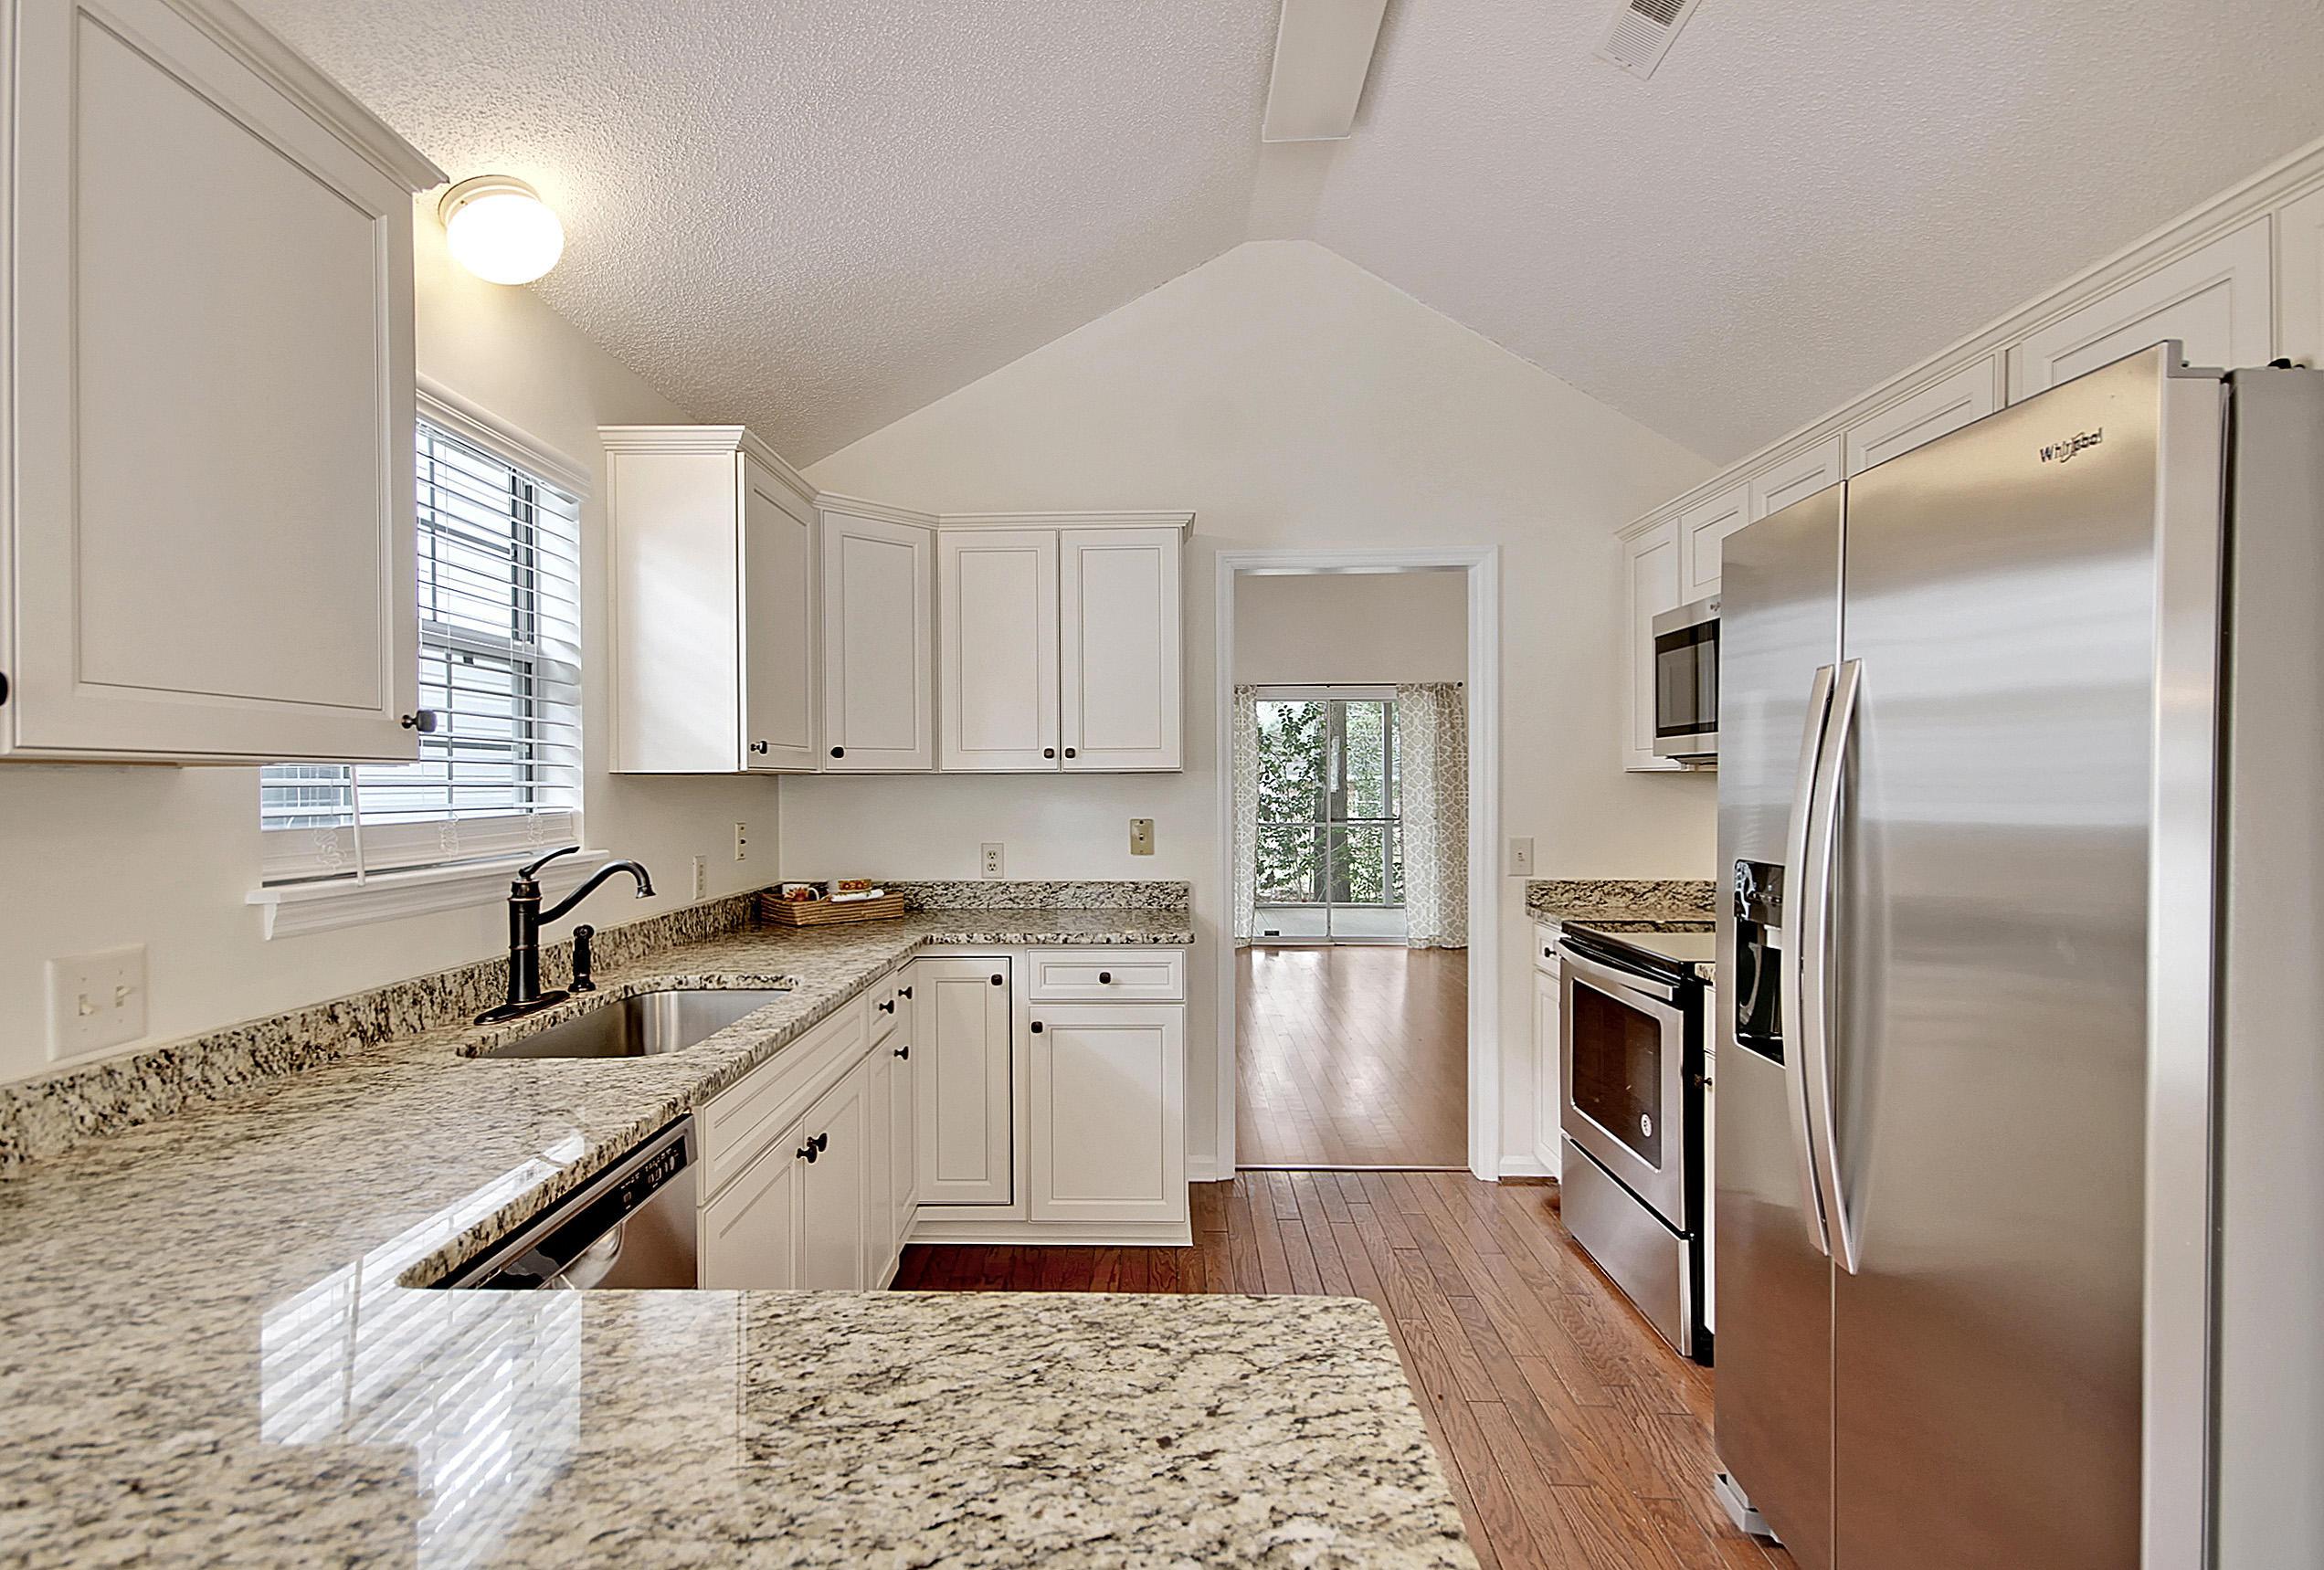 Harbor Place Homes For Sale - 845 Harbor Pl, Charleston, SC - 11